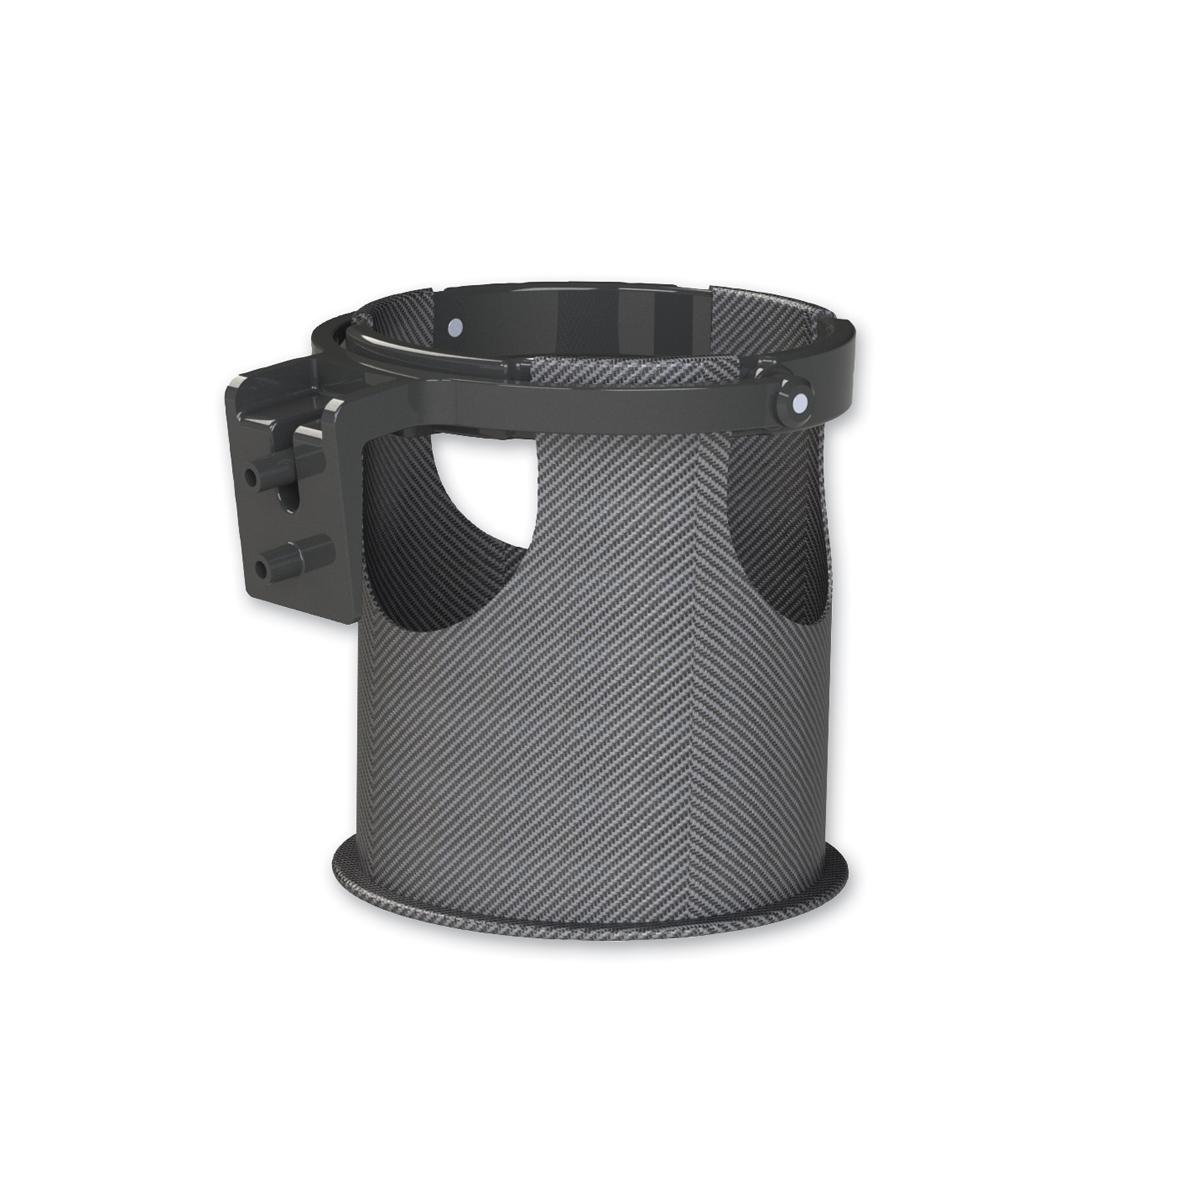 Hardbagger Cupholder for Locking Lower Fairing Door